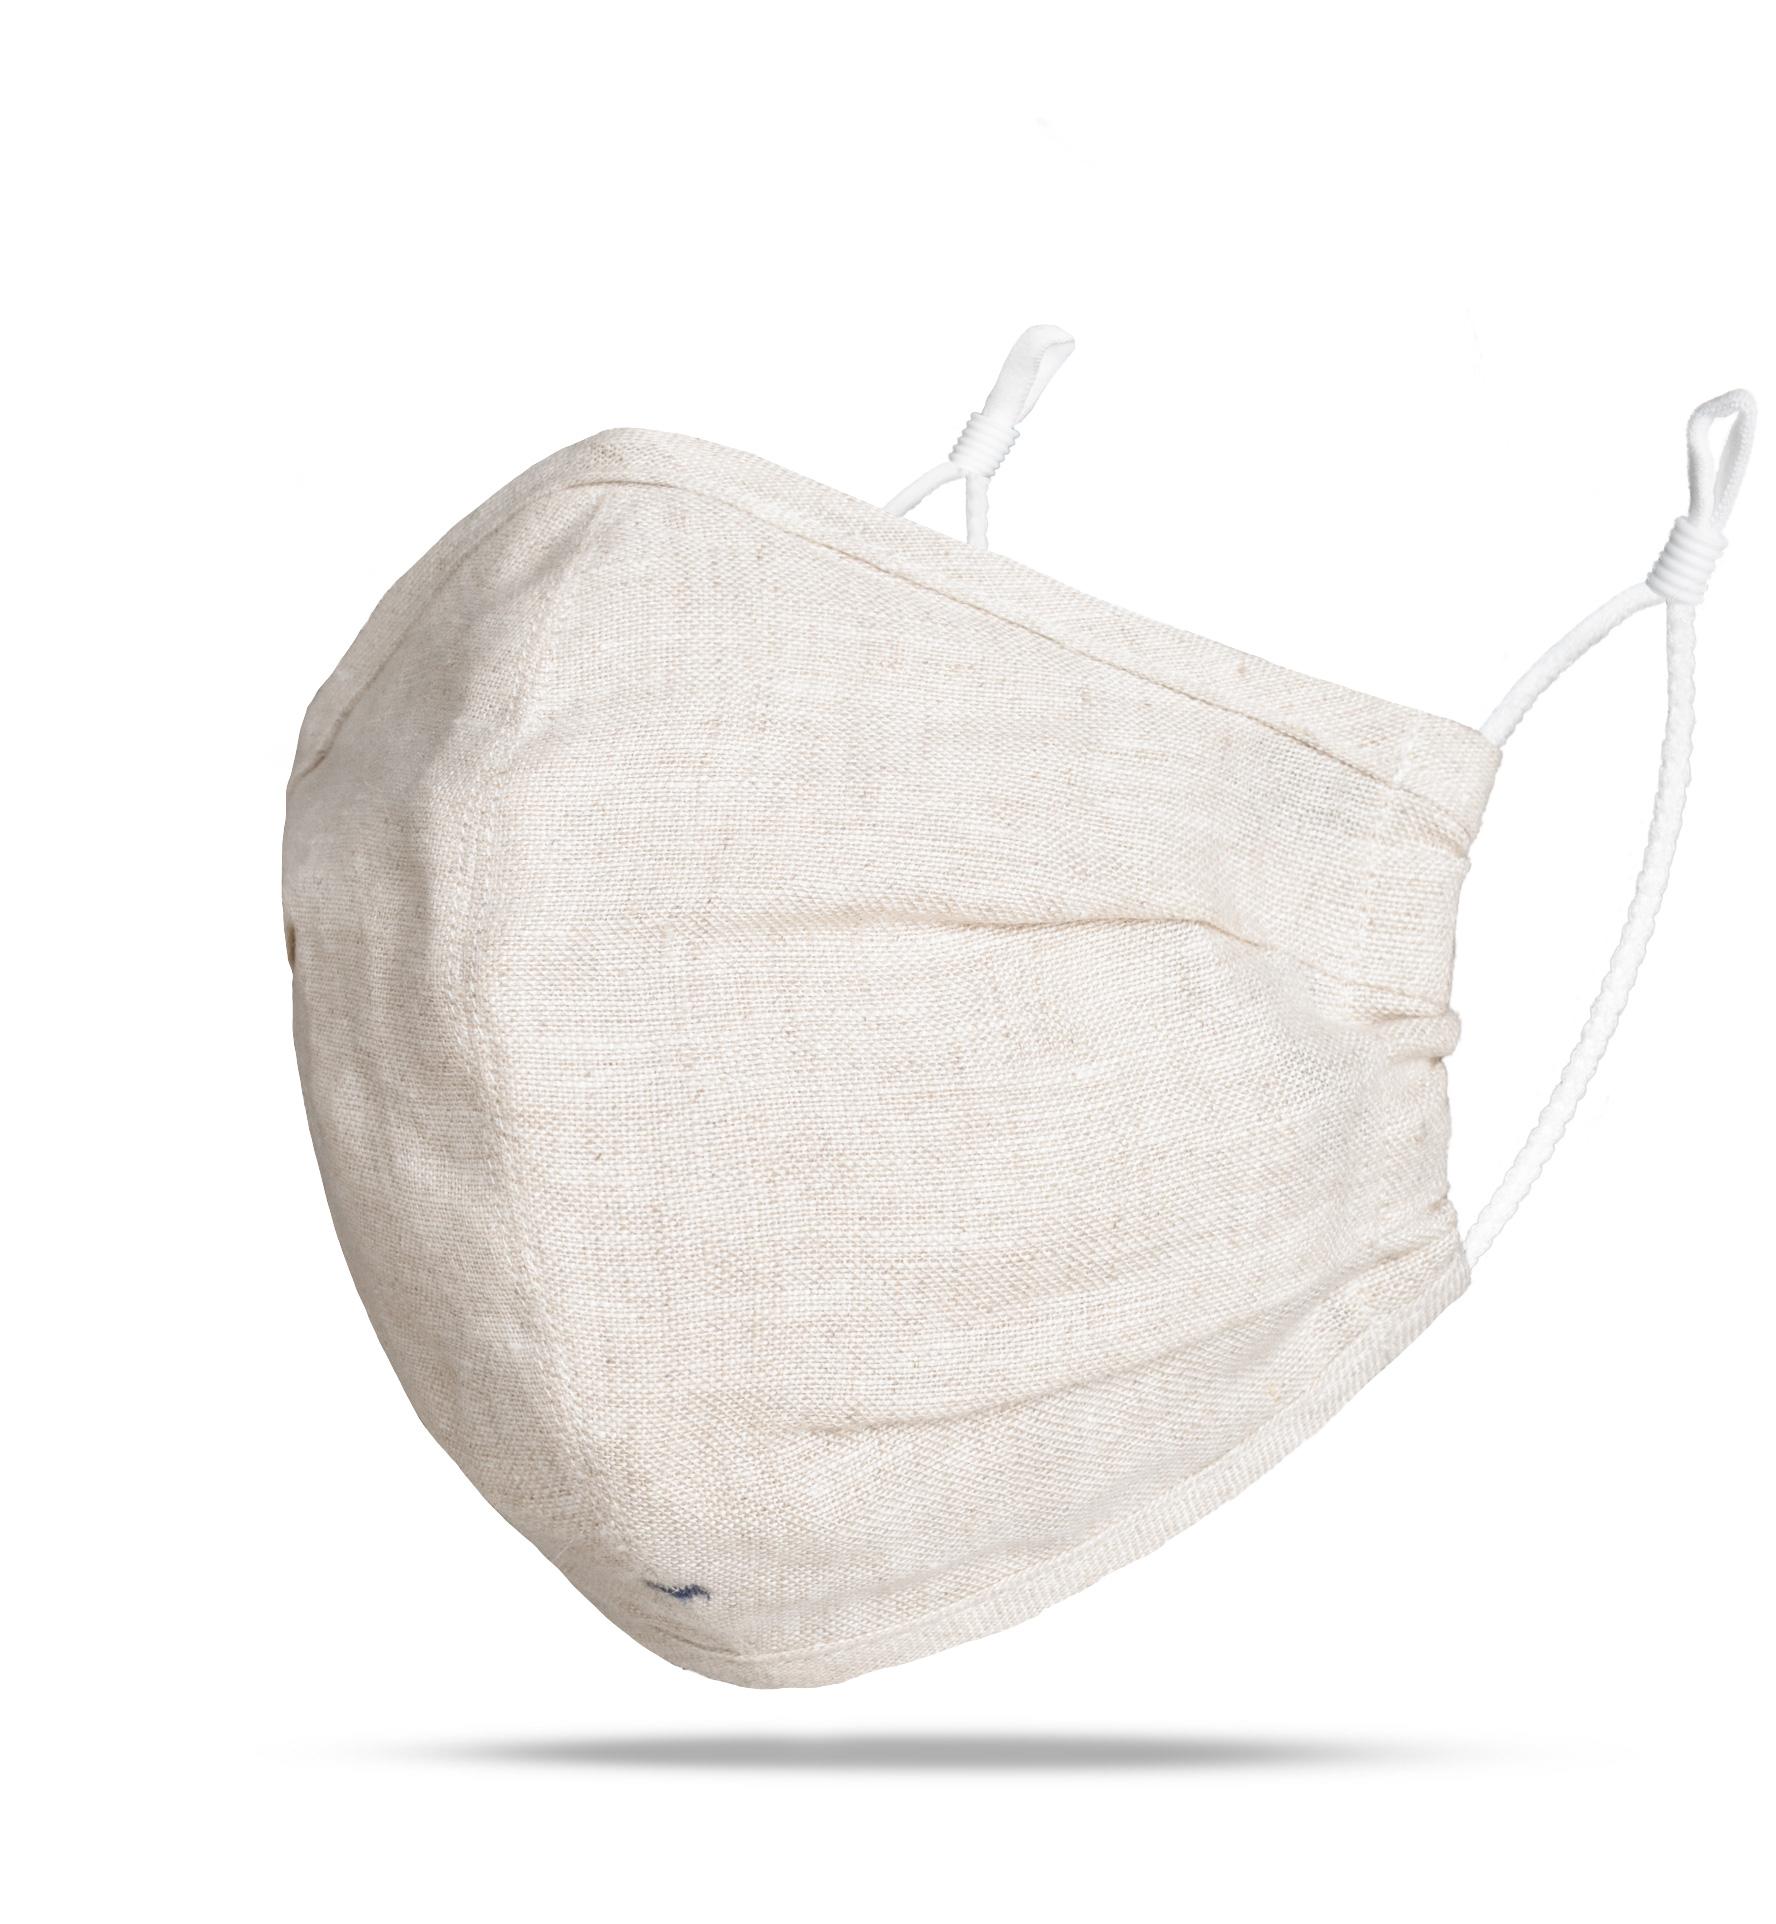 Zoom Image of The Everyday Mask v1.4E - Beige Linen (Single Mask)